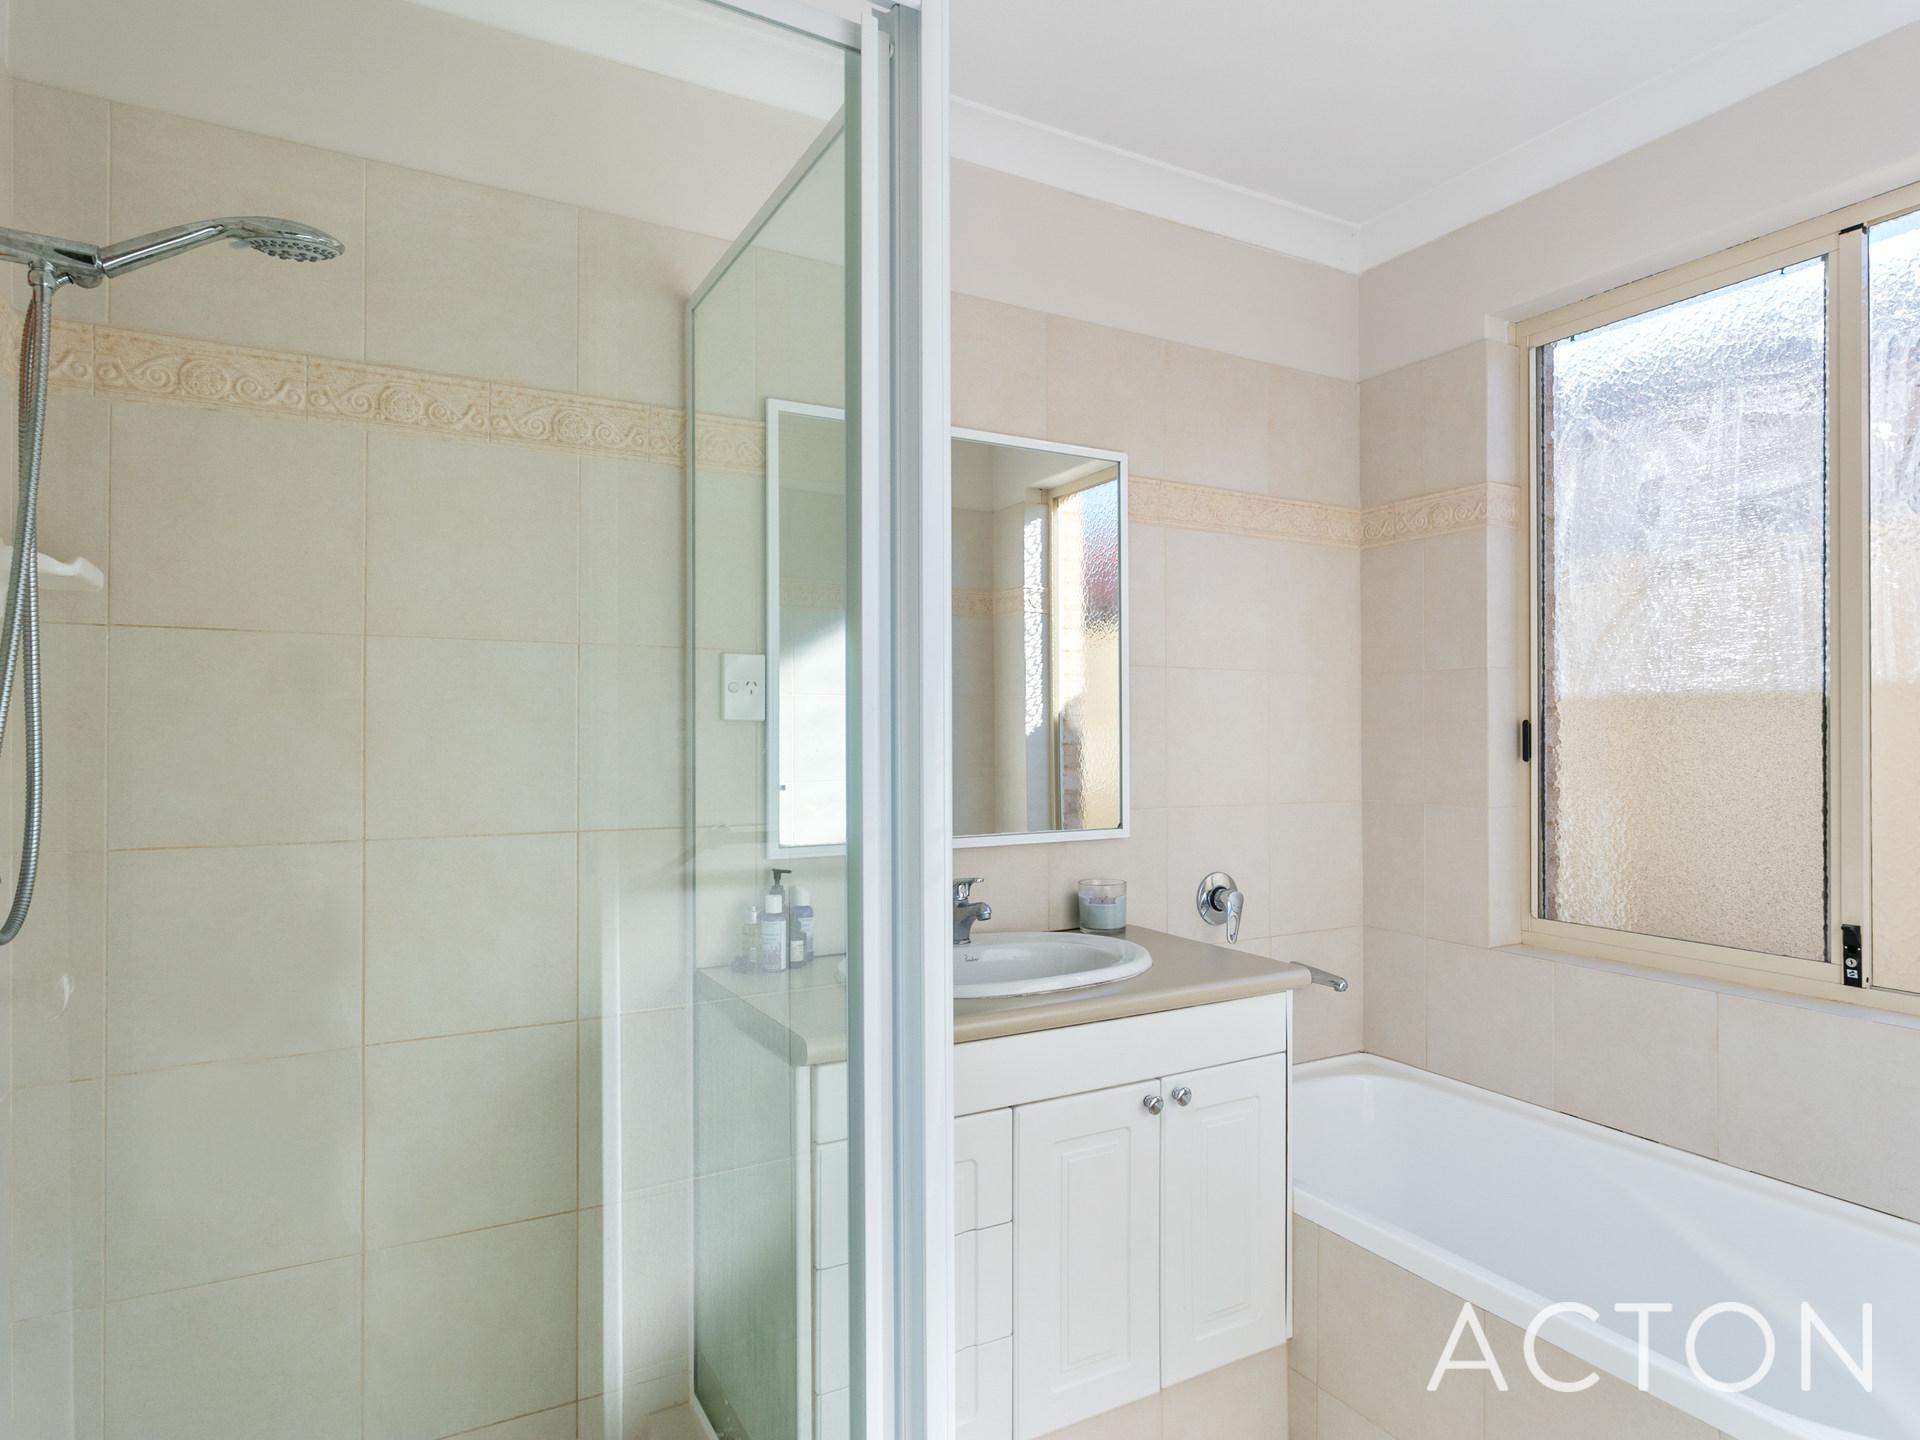 4/28 Riverina Parade Munster - Villa For Sale - 20959543 - ACTON Dalkeith